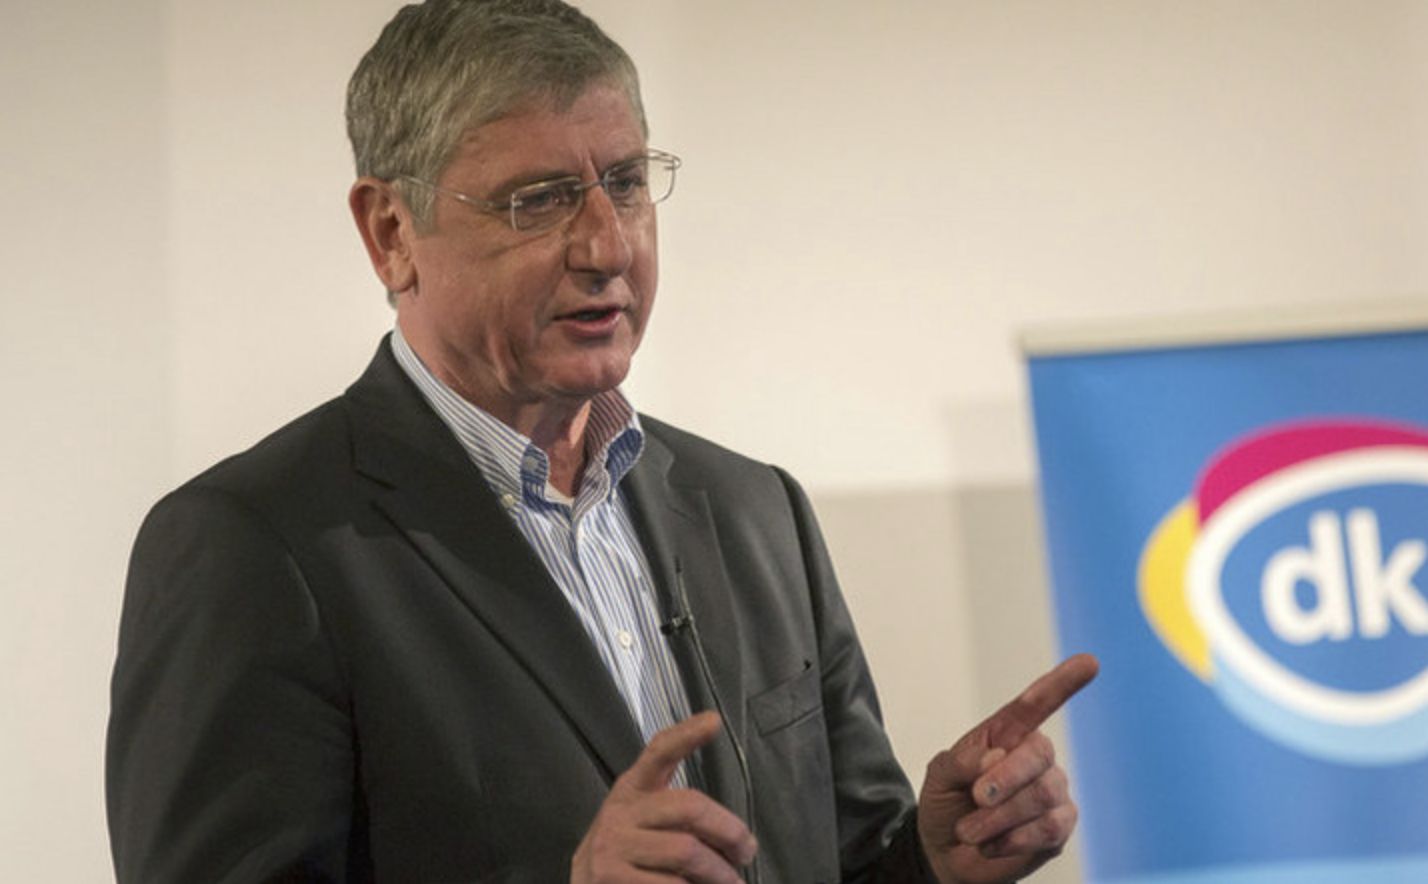 DK chairman Ferenc Gyurcsány demands recount, hand-written documents 1